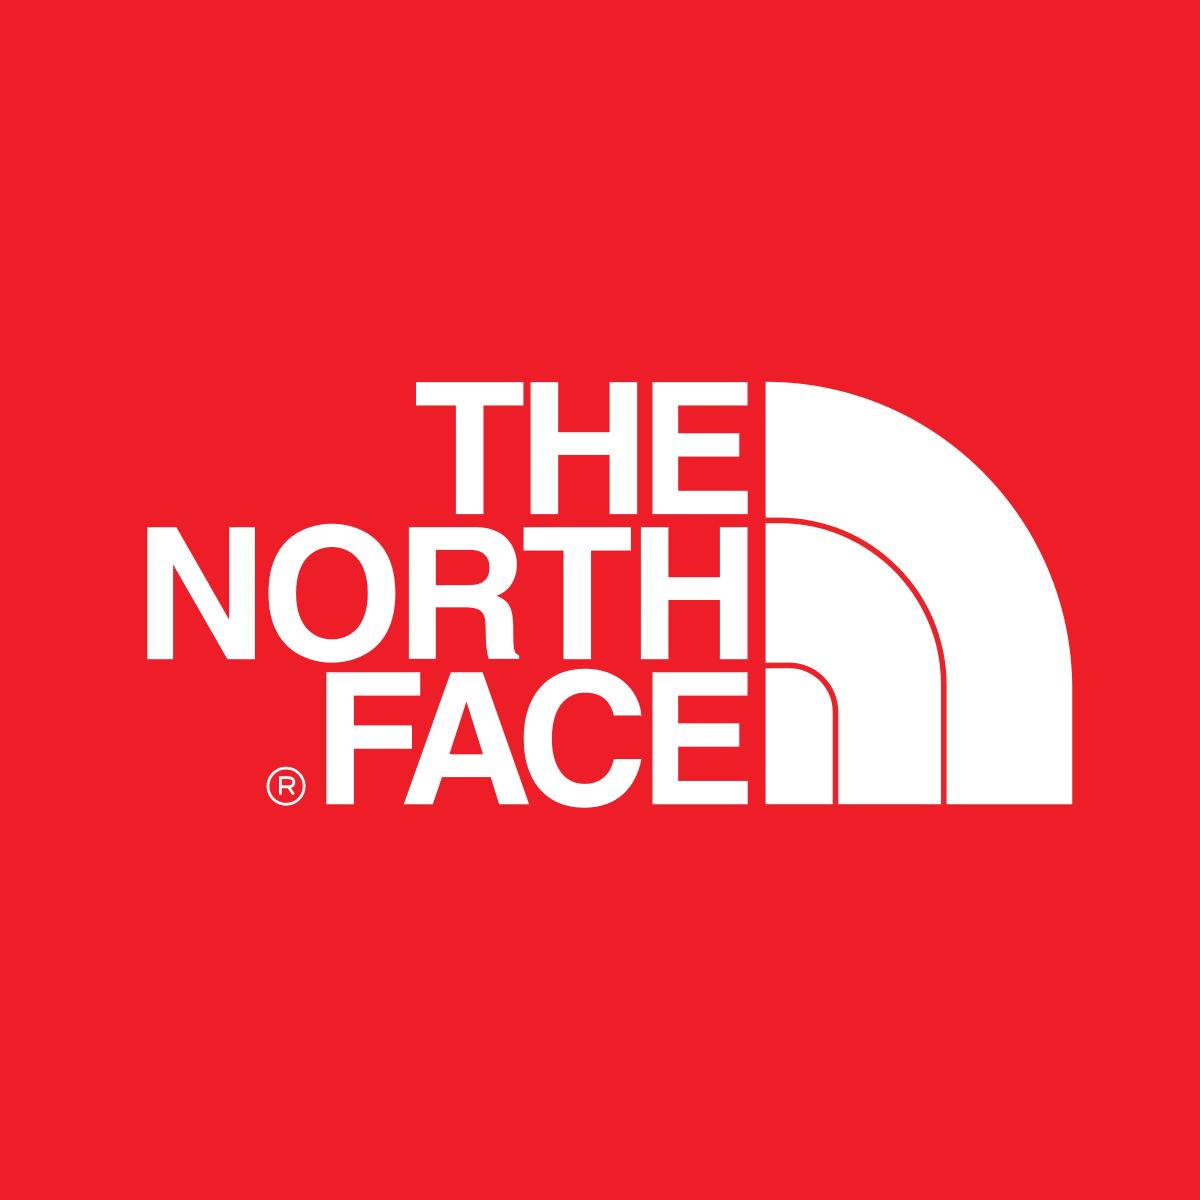 nortface.png